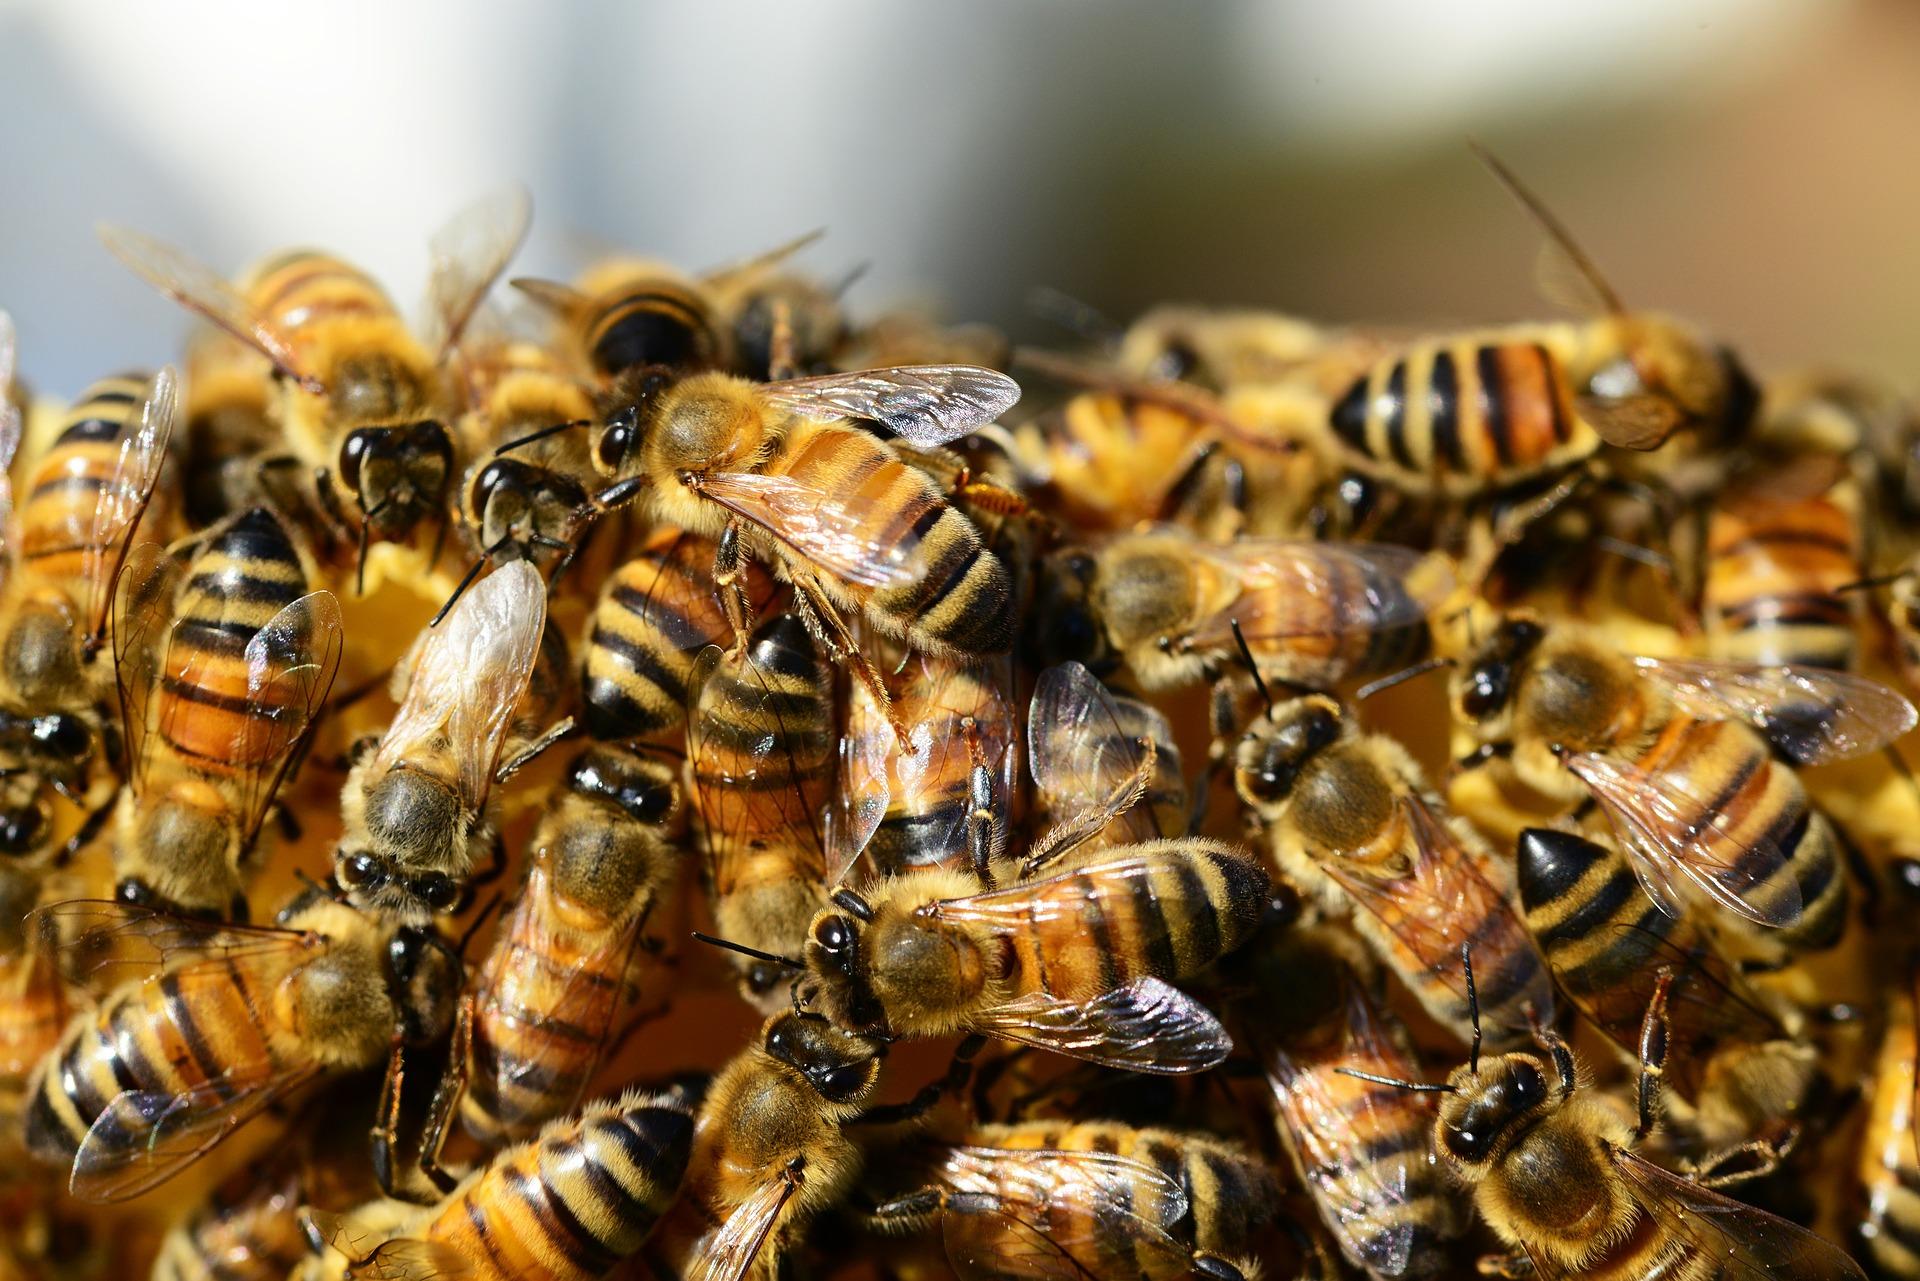 honey-bees-326334_1920.jpg